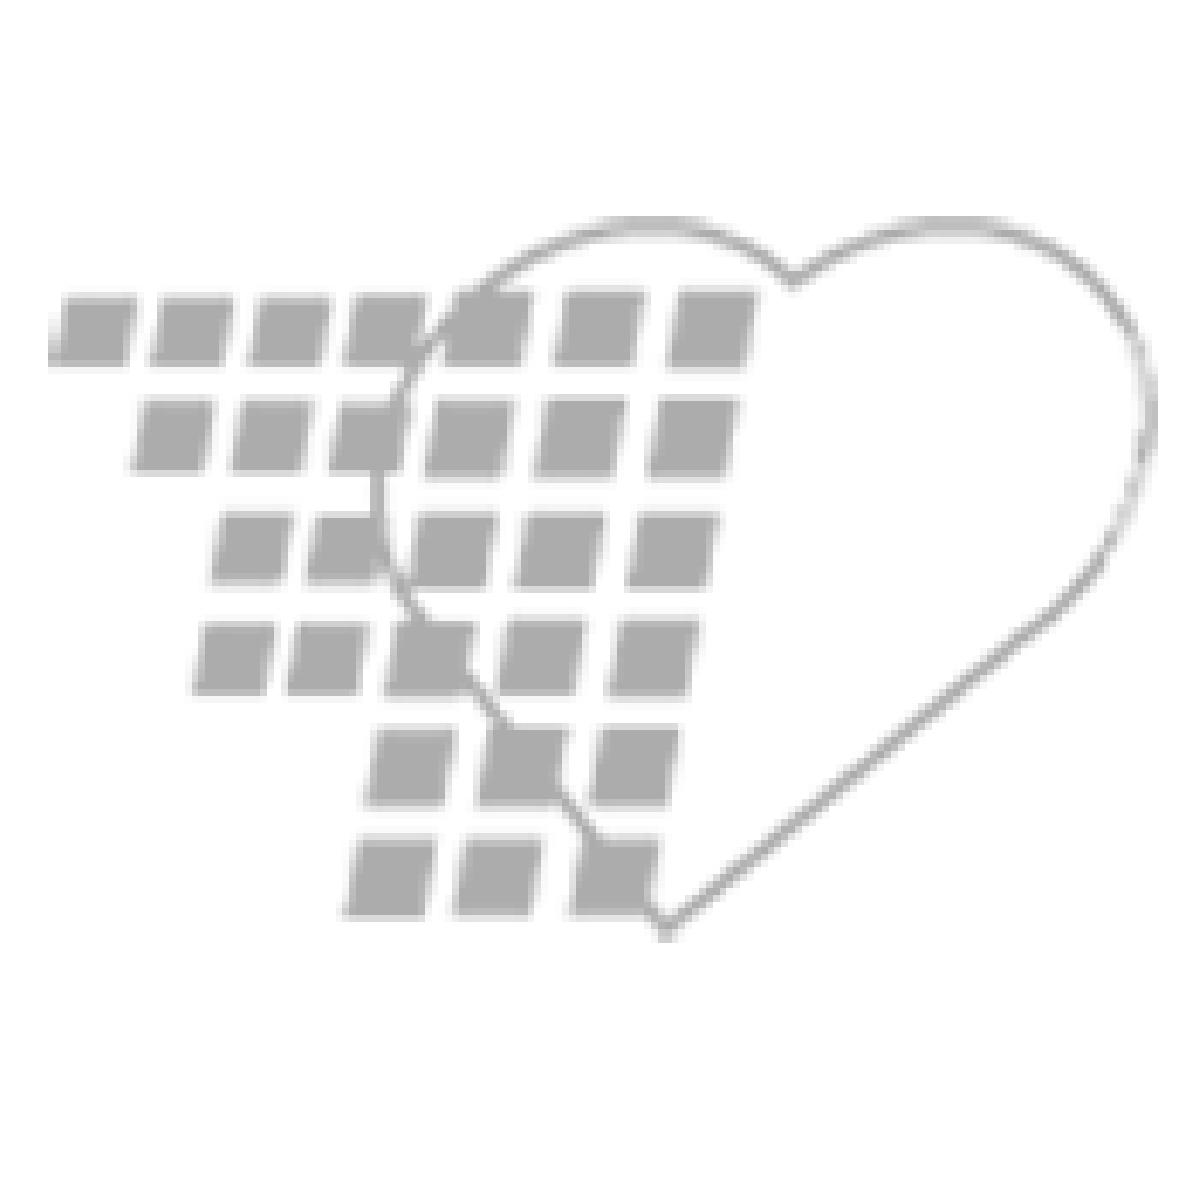 02-38-5315 CoaguChek XS PT Test Strips